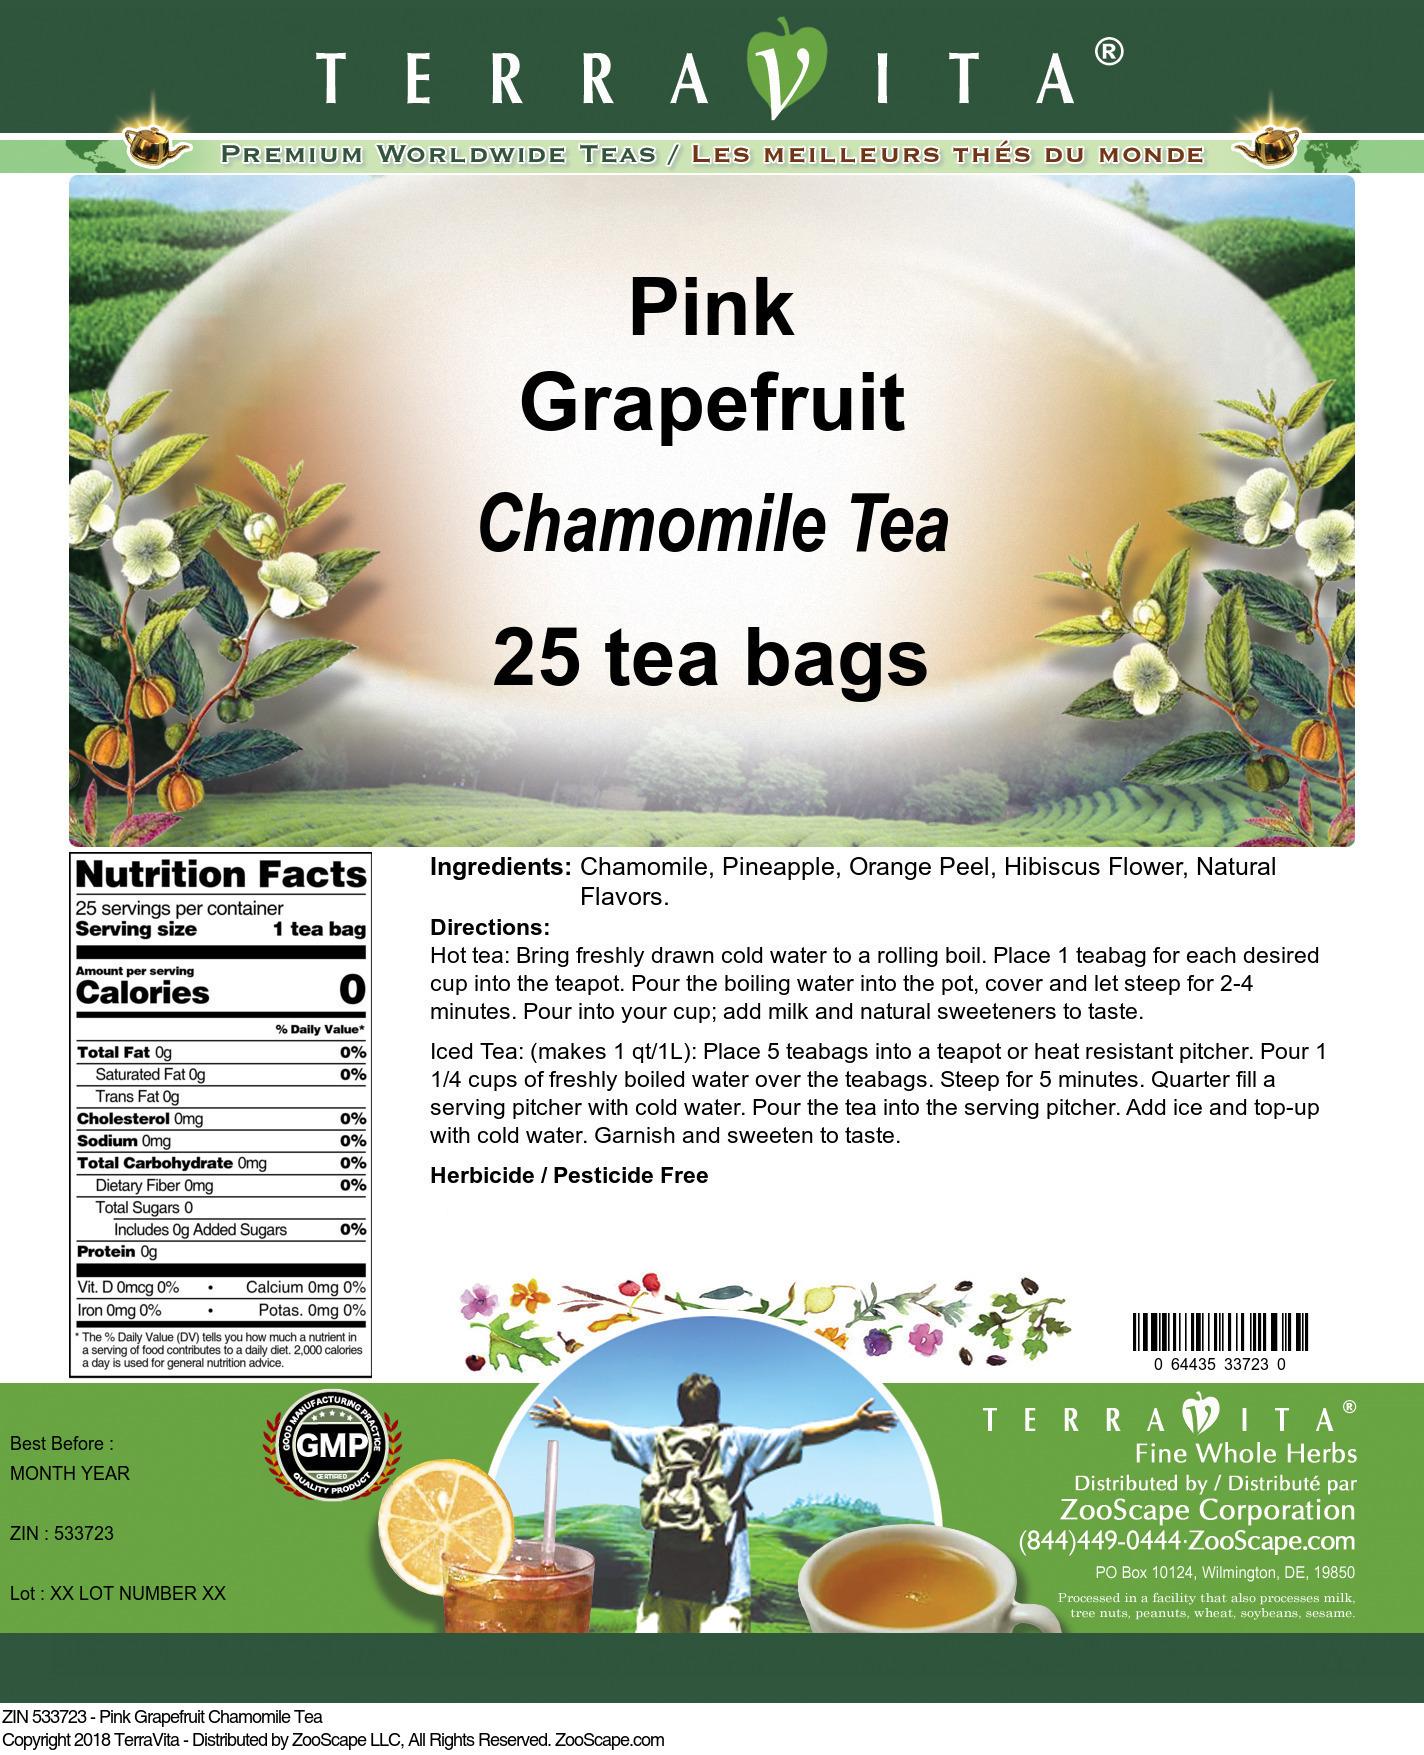 Pink Grapefruit Chamomile Tea